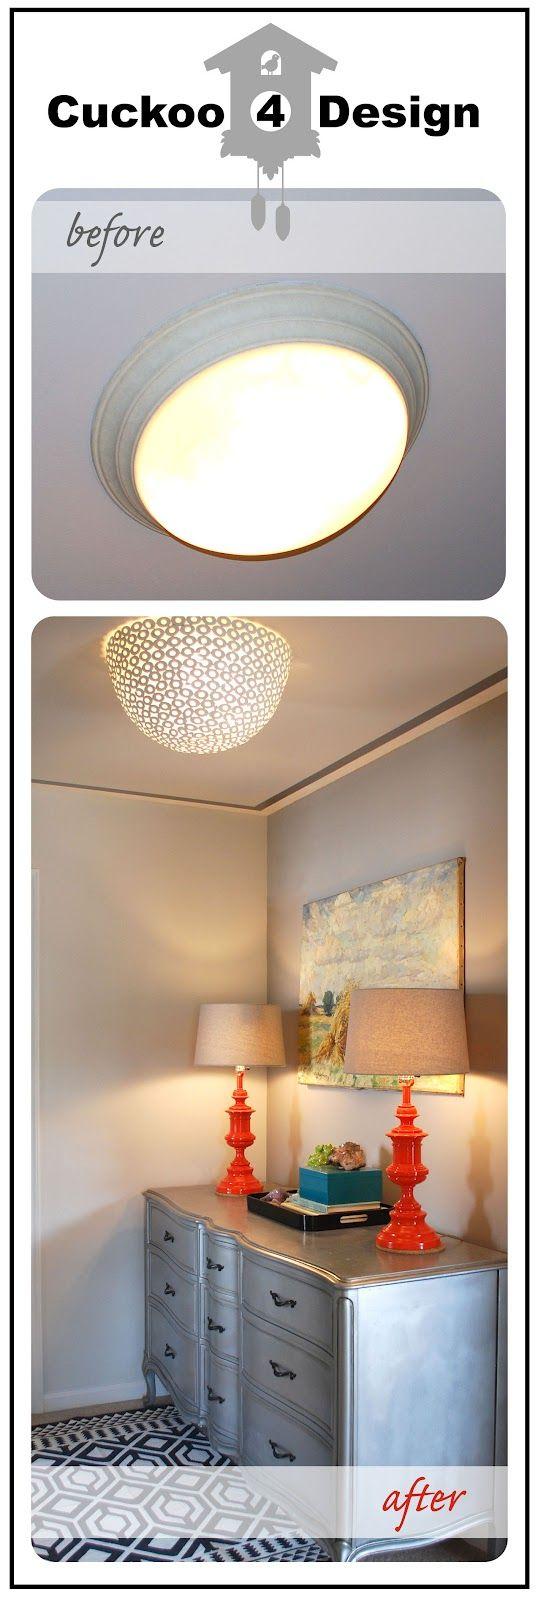 homegoods clearance bowl as diy ceiling fixture diy make sense diy home decor ceiling. Black Bedroom Furniture Sets. Home Design Ideas